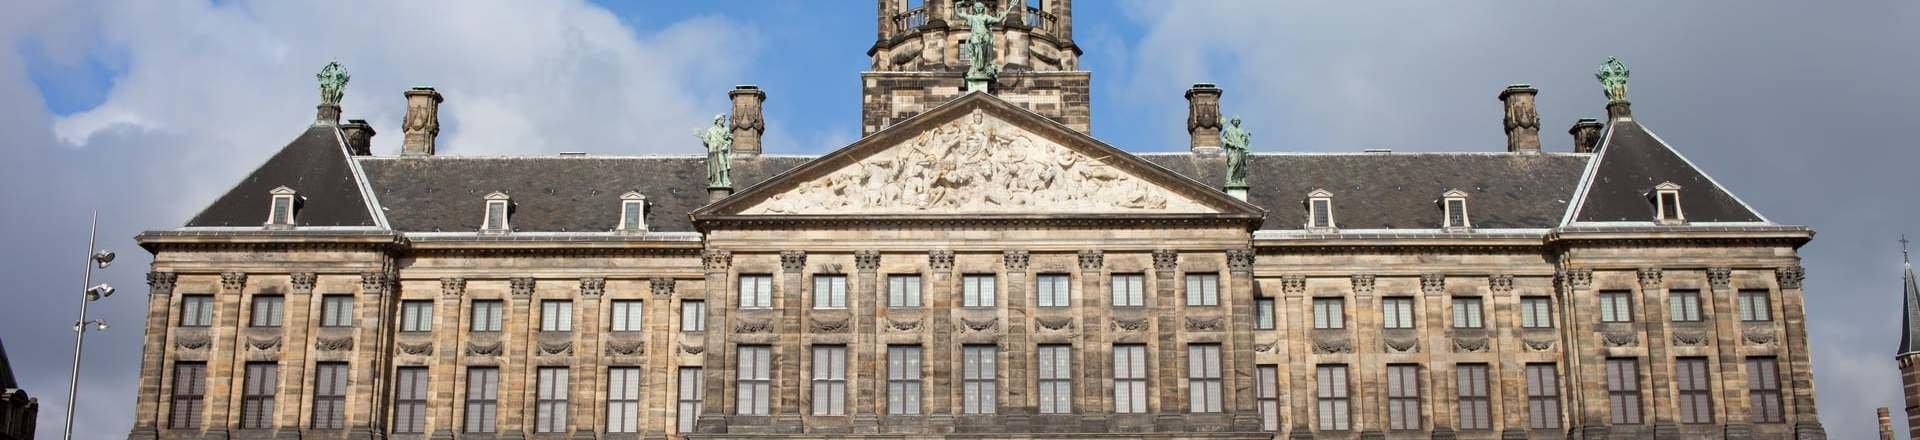 Hoteles en amsterdam baratos destinia for Hoteles en el centro de amsterdam